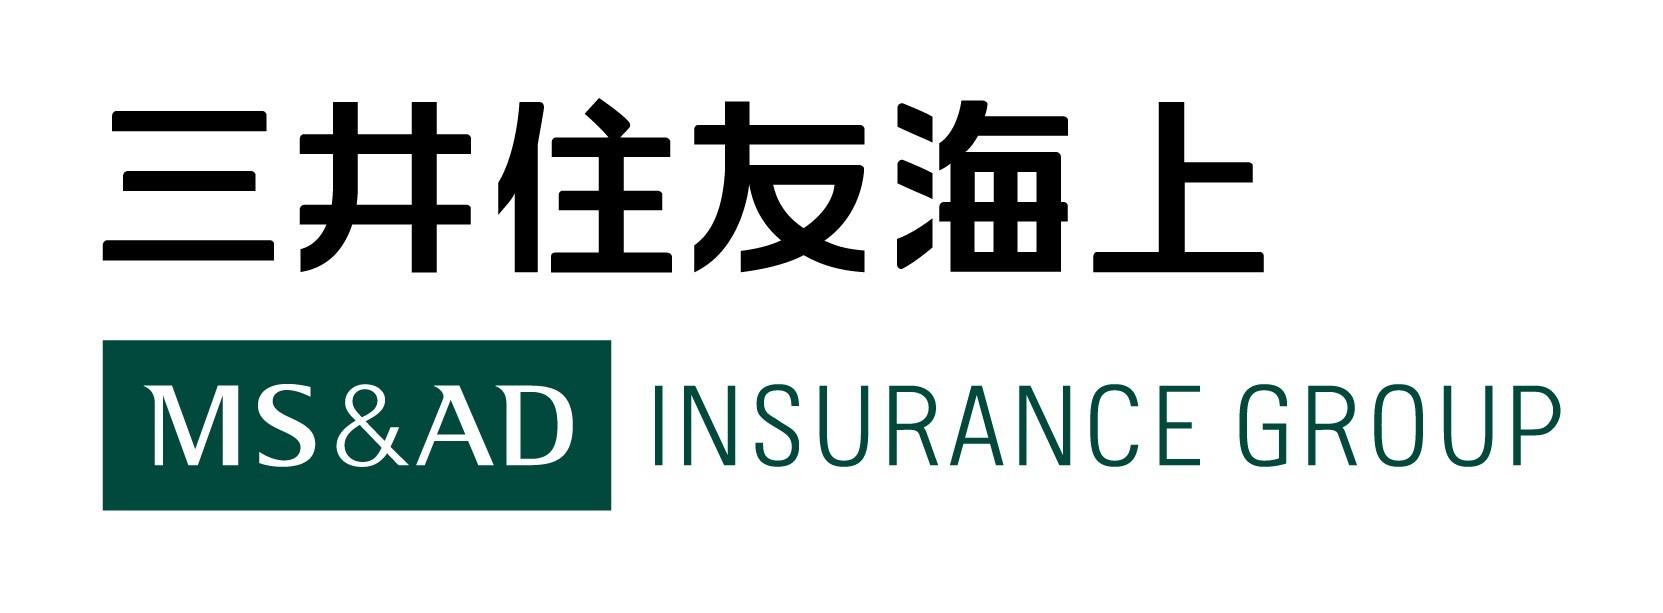 三井住友海上火災保険 ロゴ